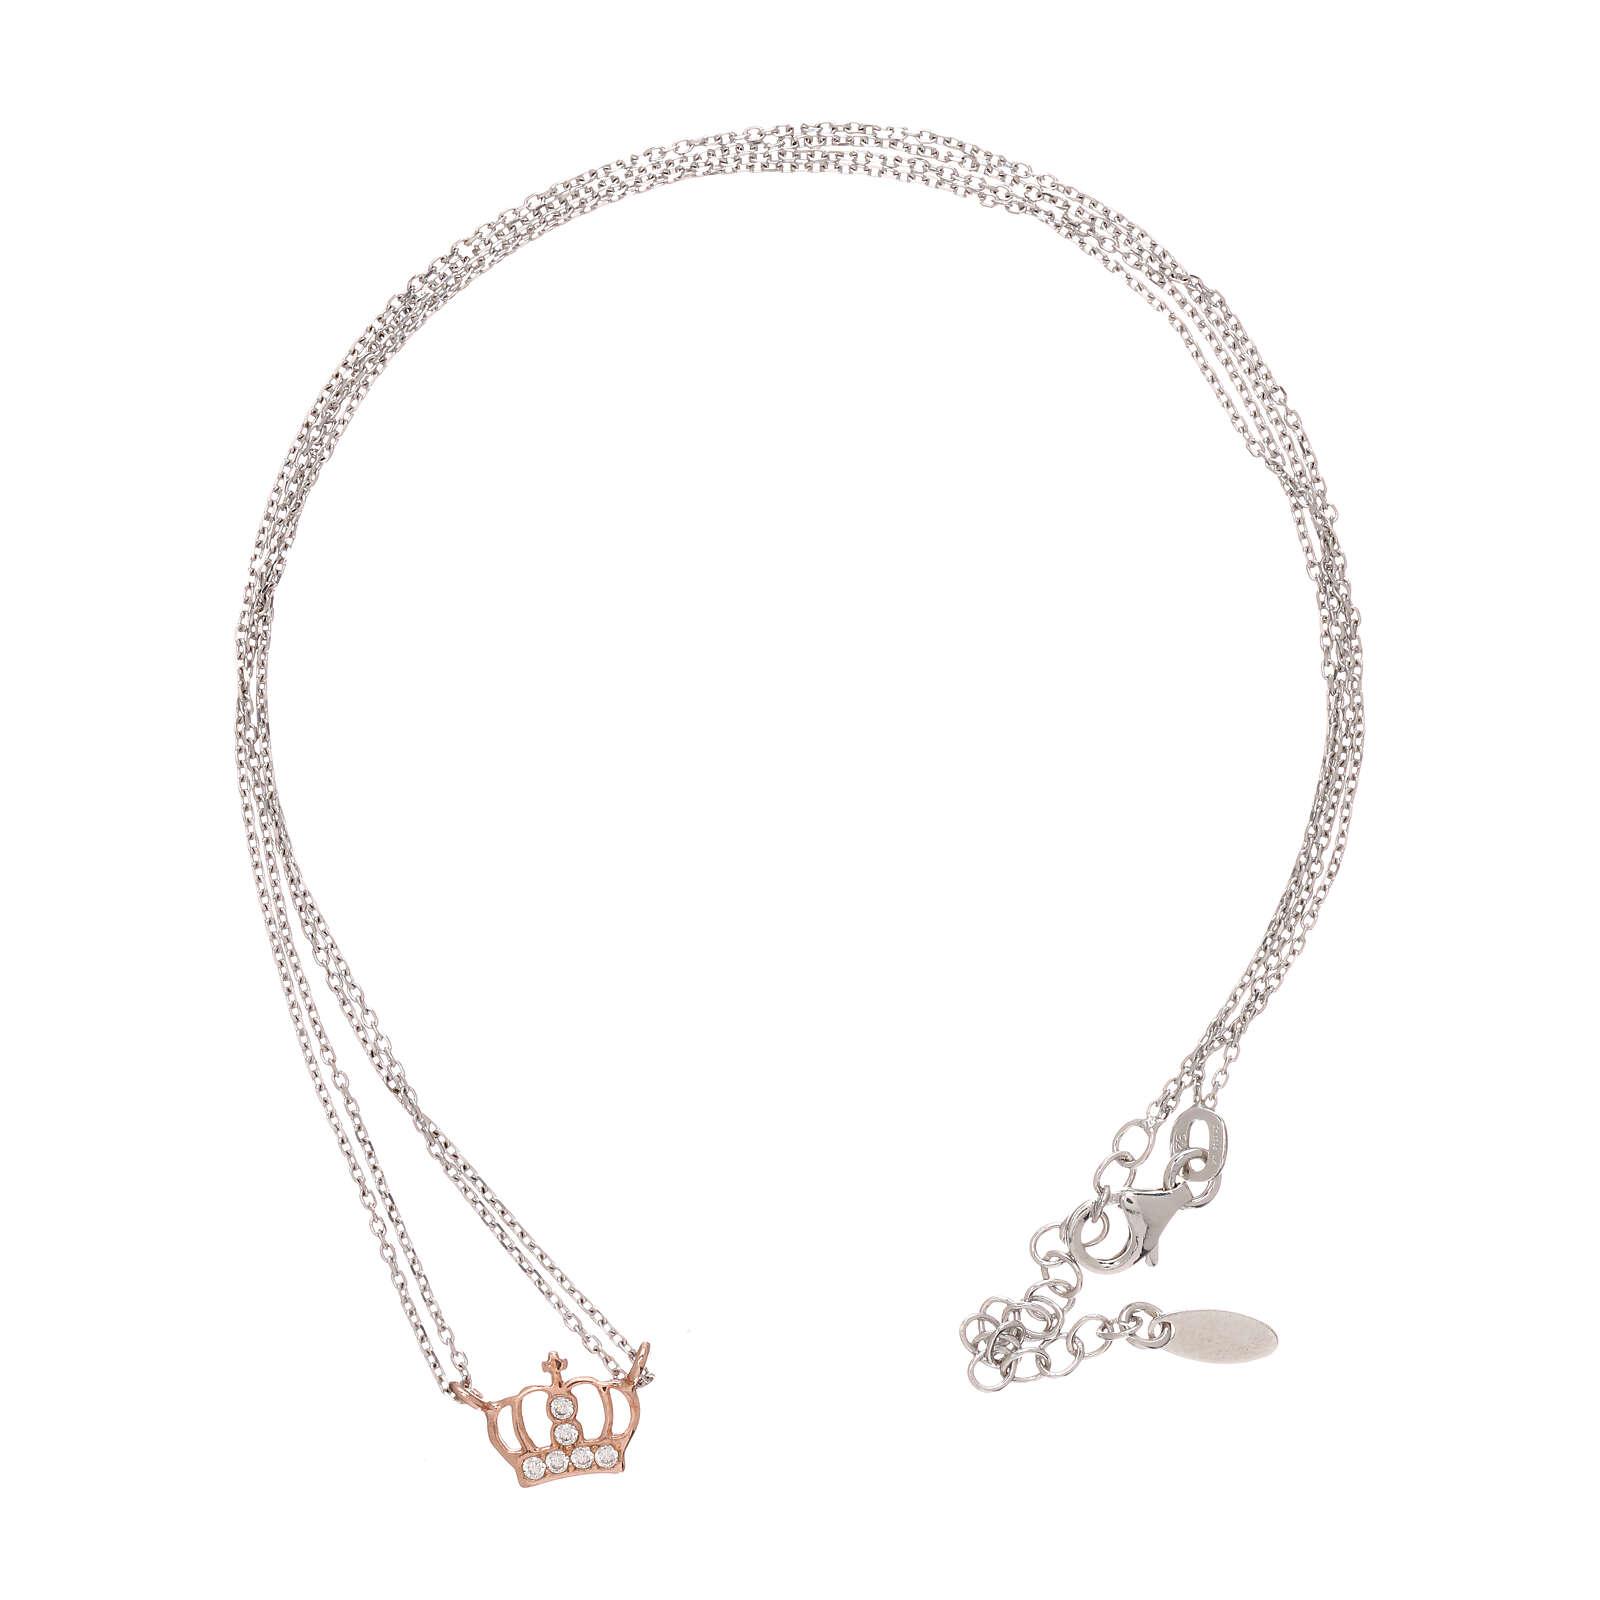 Collar AMEN plata 925 rodiada/rosada corona zircones blancos 4